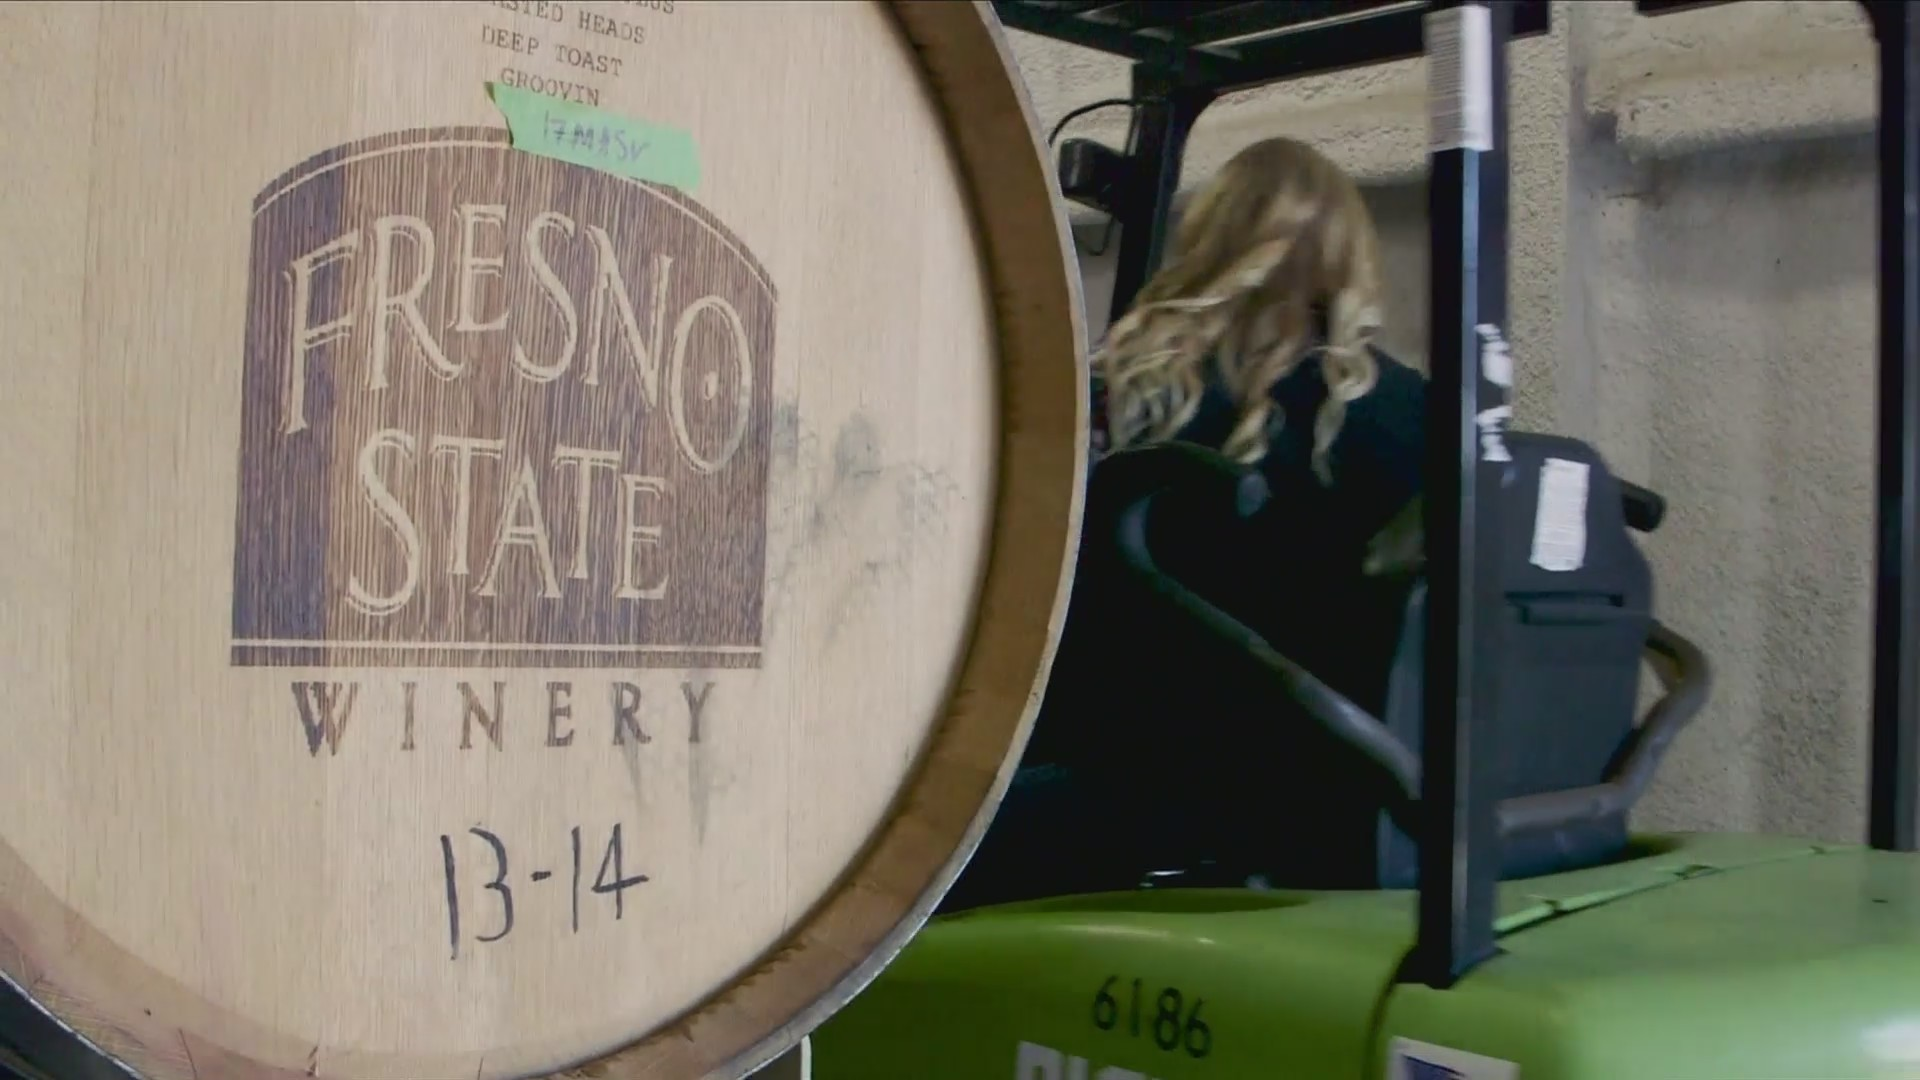 Fresno_State_Wine_making_0_20190129051805